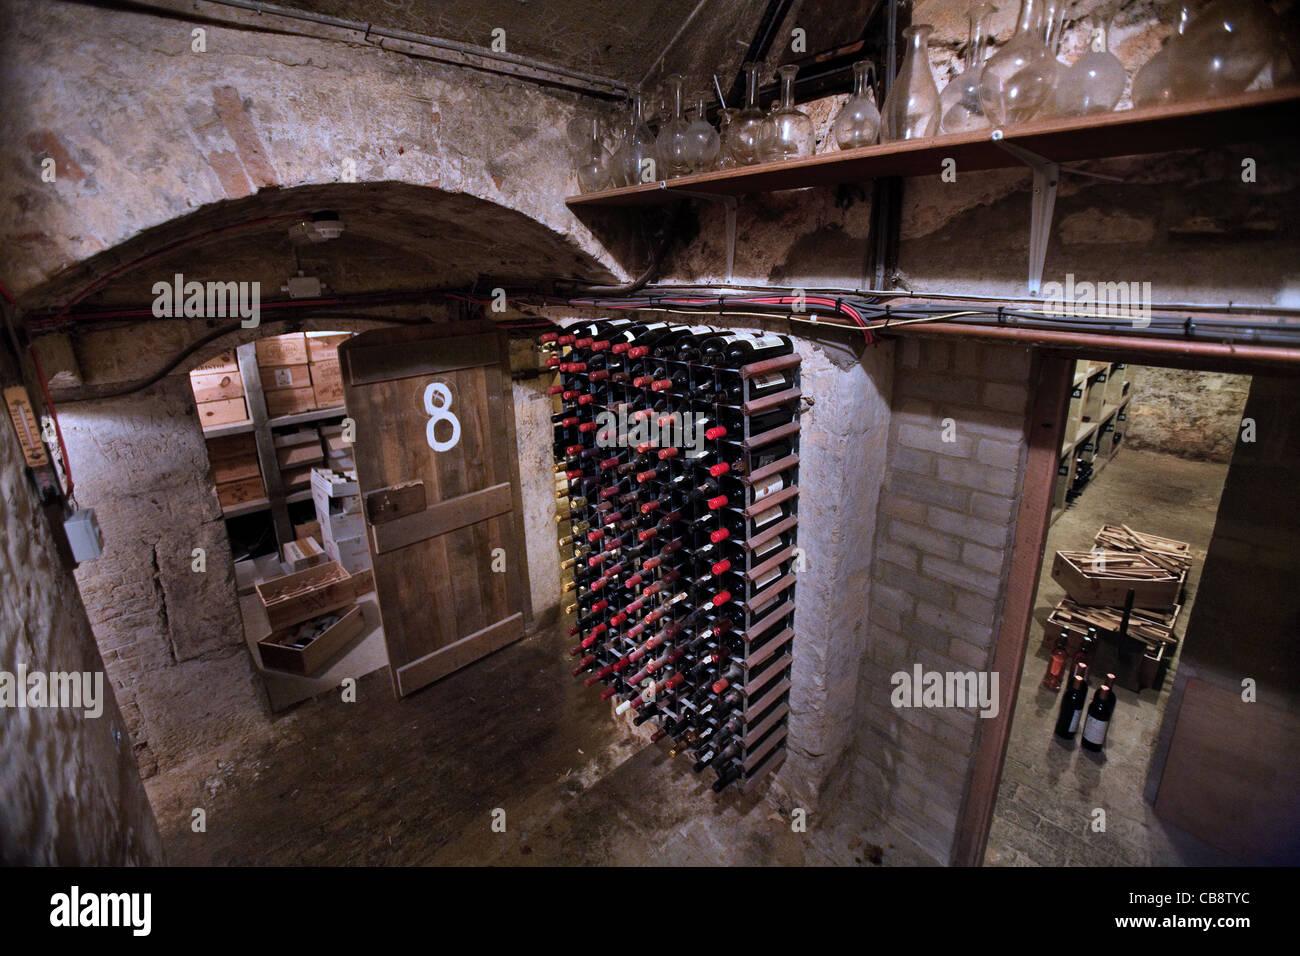 Wine Cellar in the Jesus College, Oxford - Stock Image